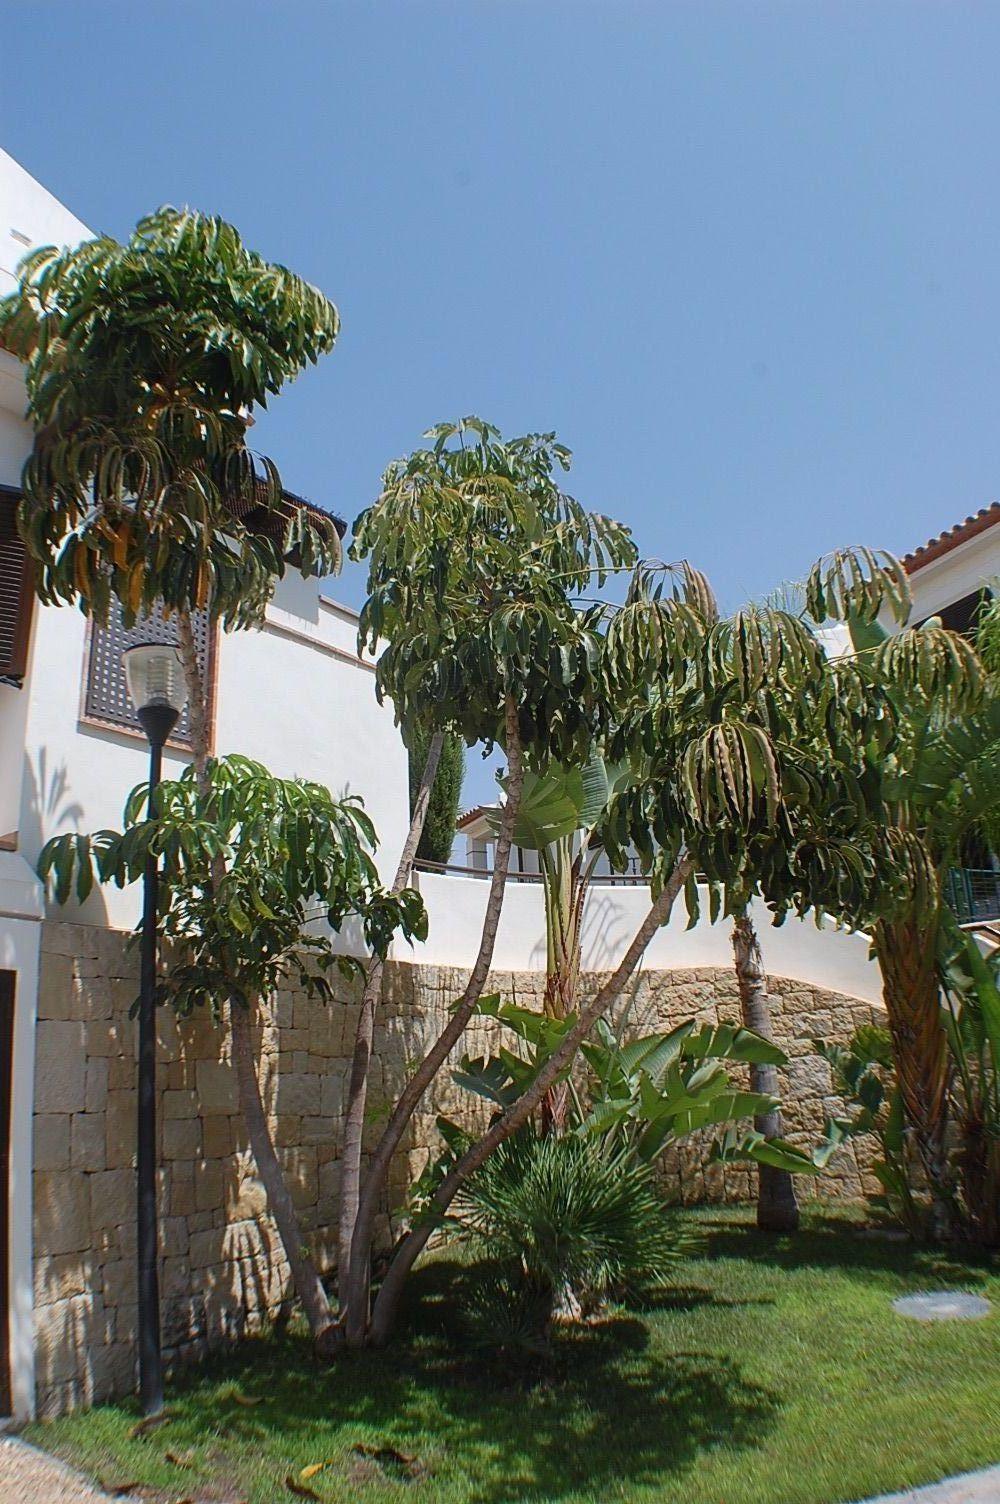 Casa adosada en Finestrat, SIERRA CORTINA, venta